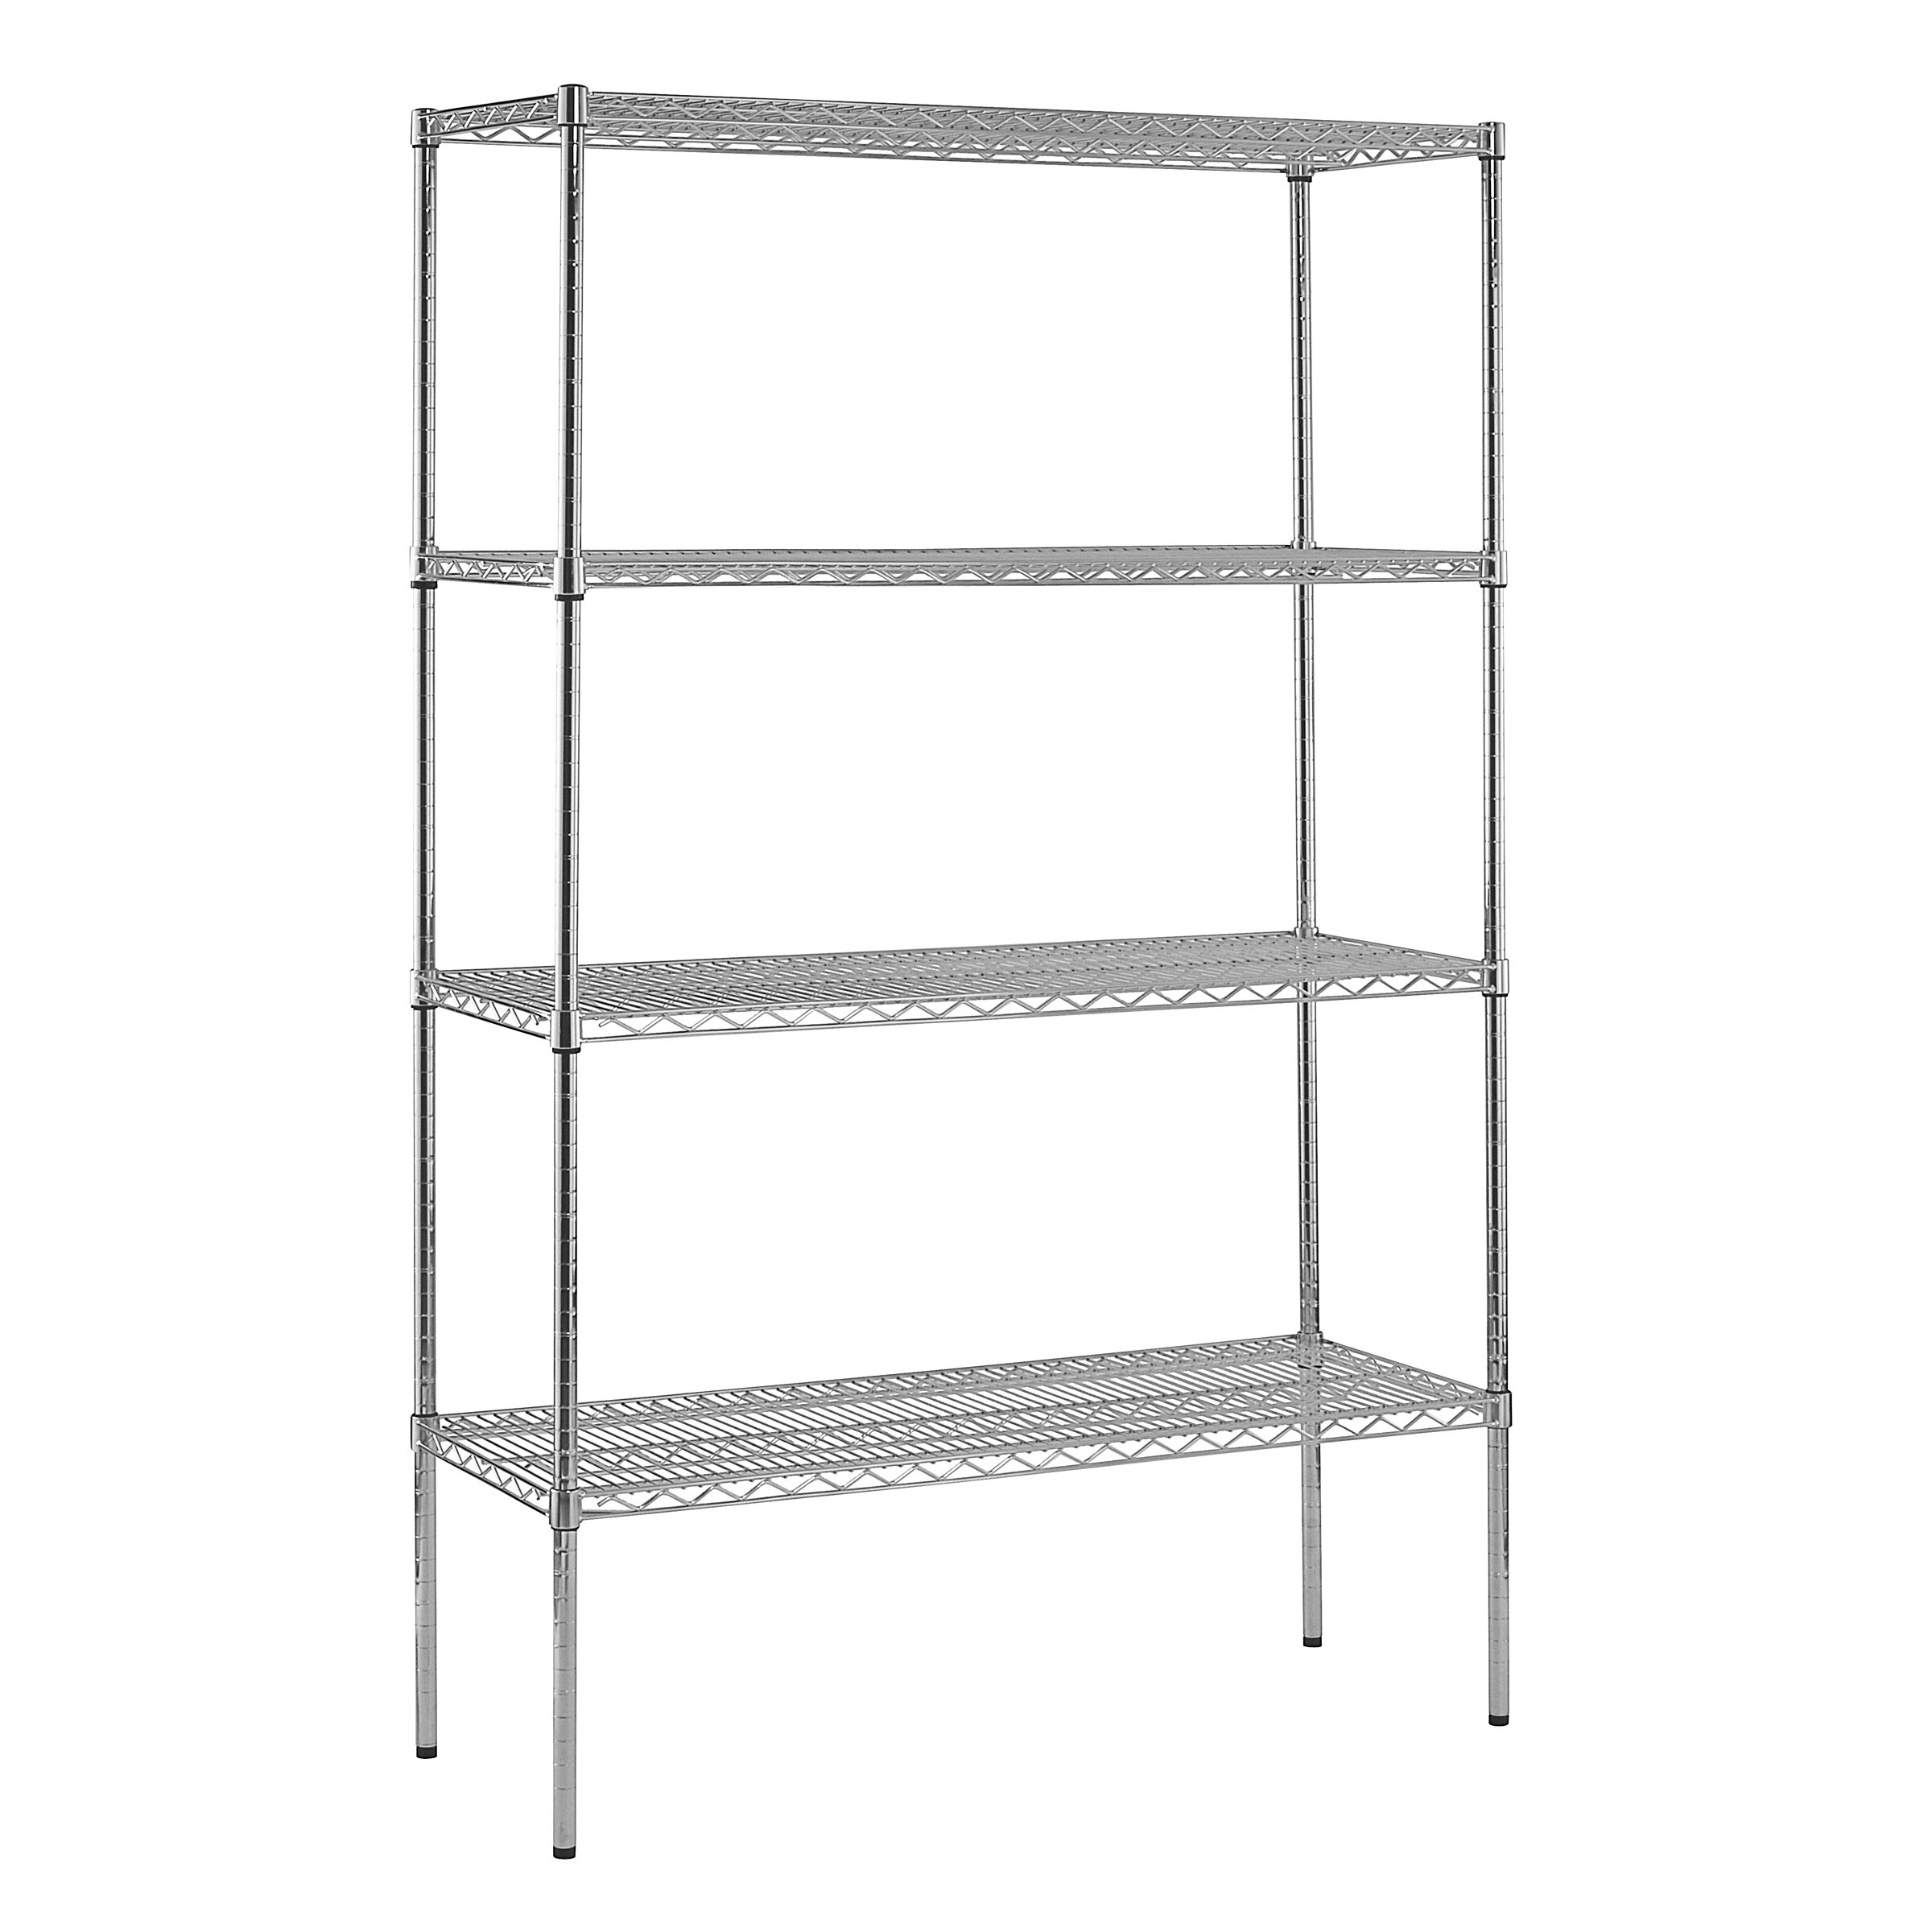 Sandusky Heavy Duty Shelf Wire Shelving Unit Reviews